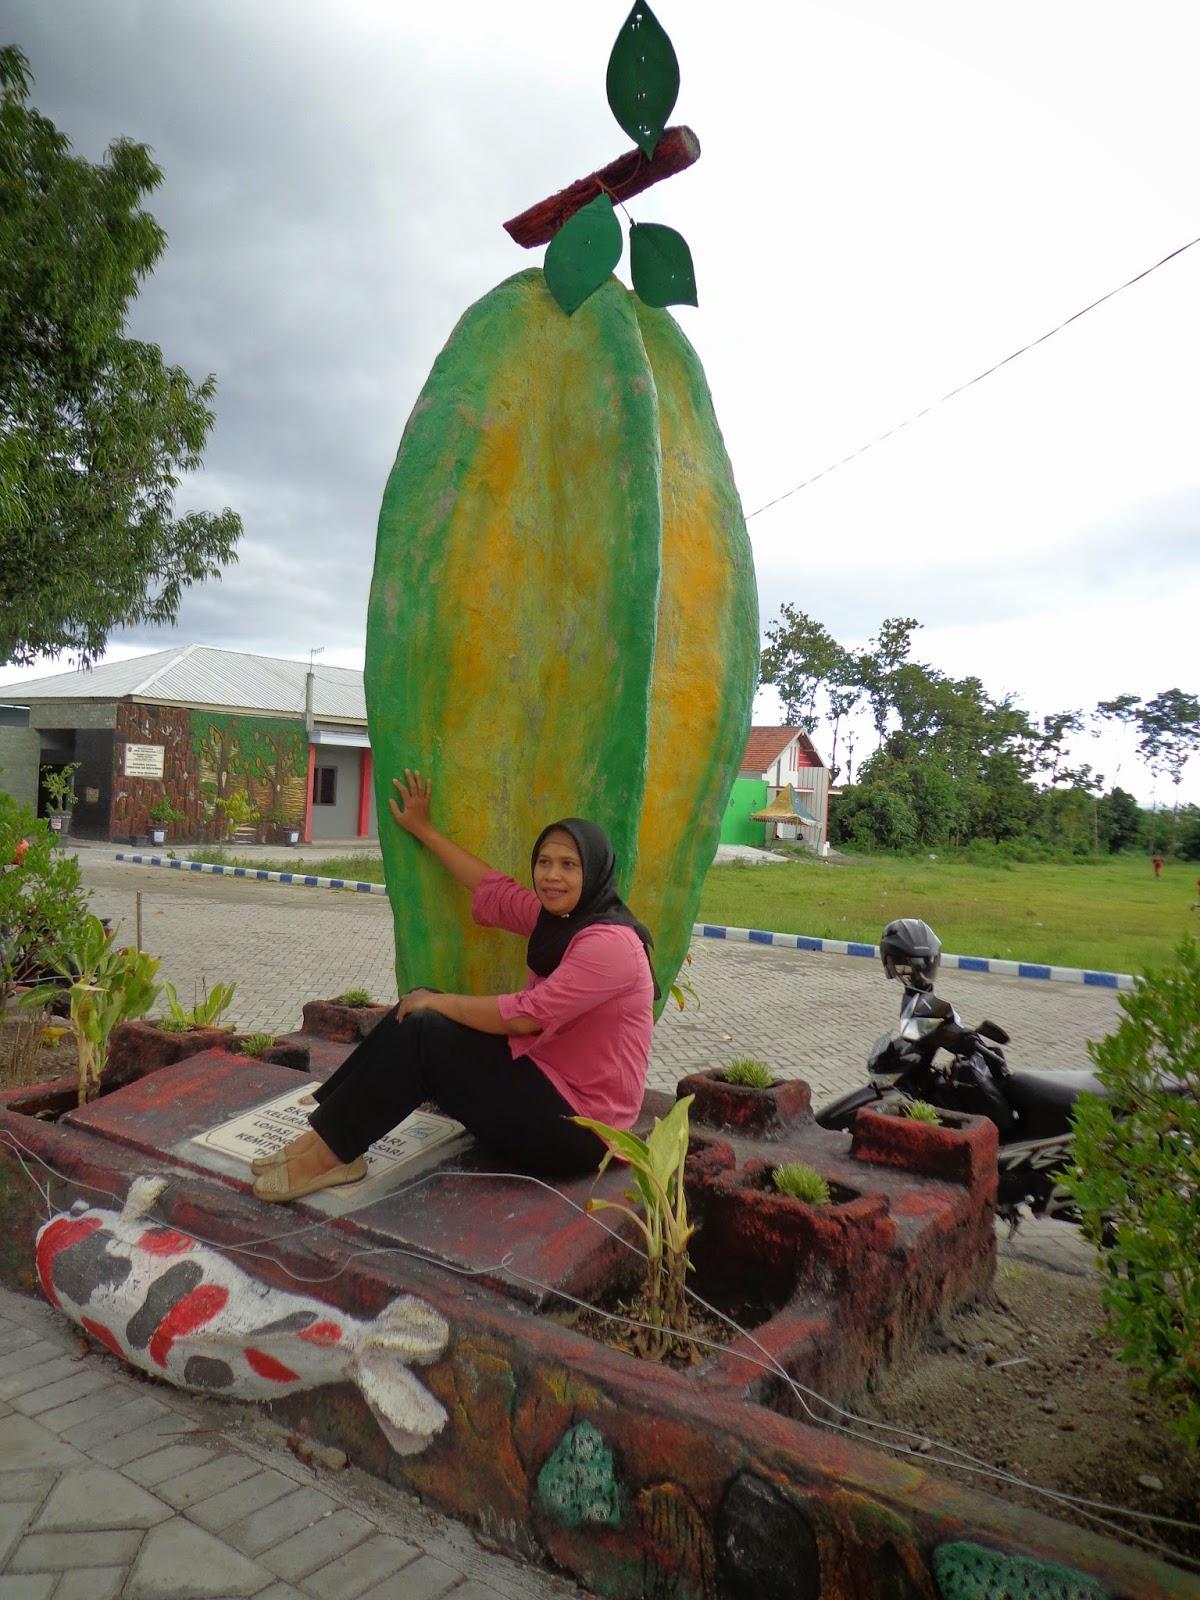 Wisata Agro Karangsari Rekreasi Sambil Memetik Belimbing Tempat Id Mengeksplor